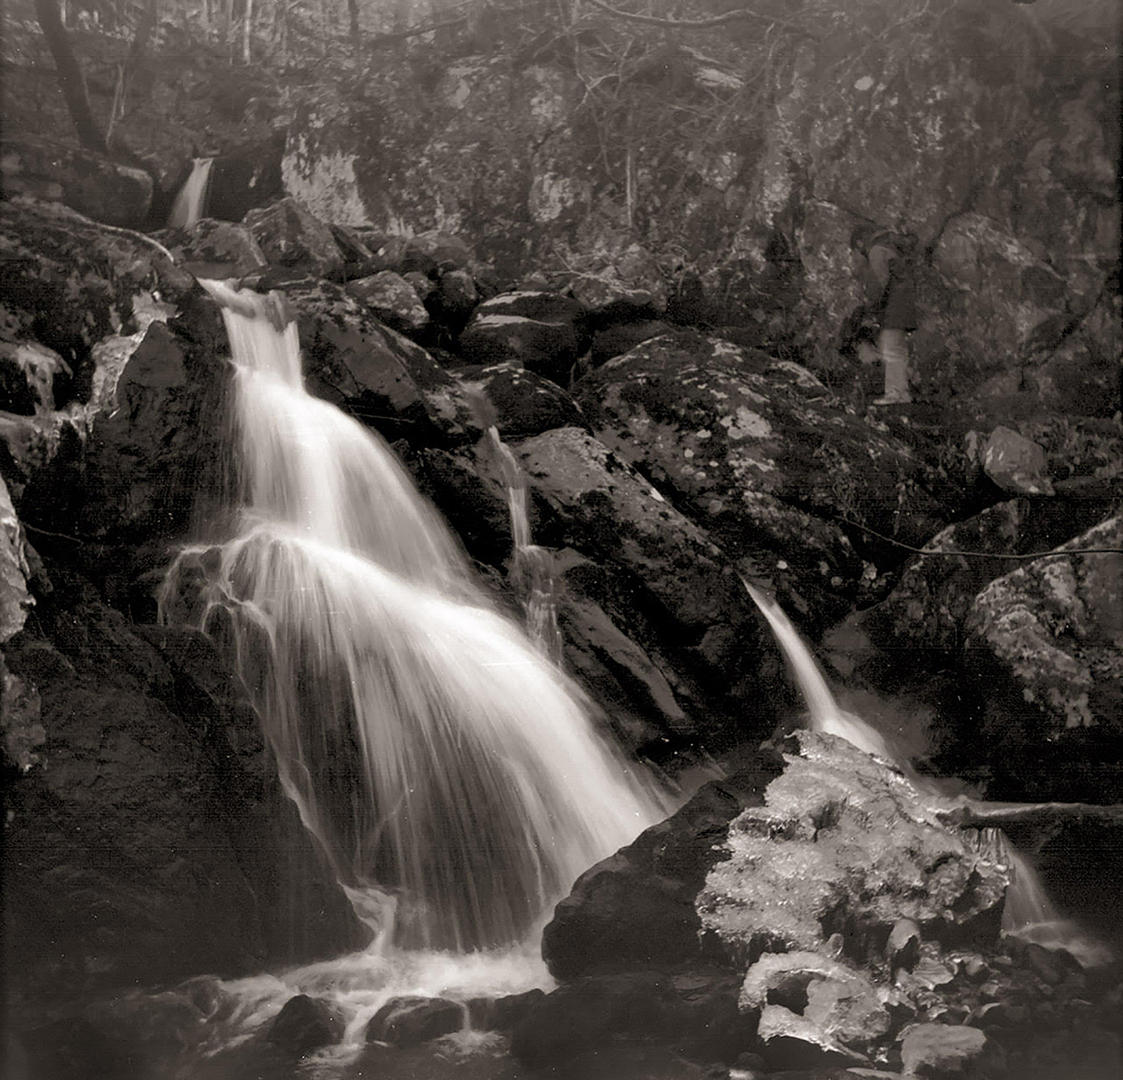 Eben Ostby - The Secret Waterfall